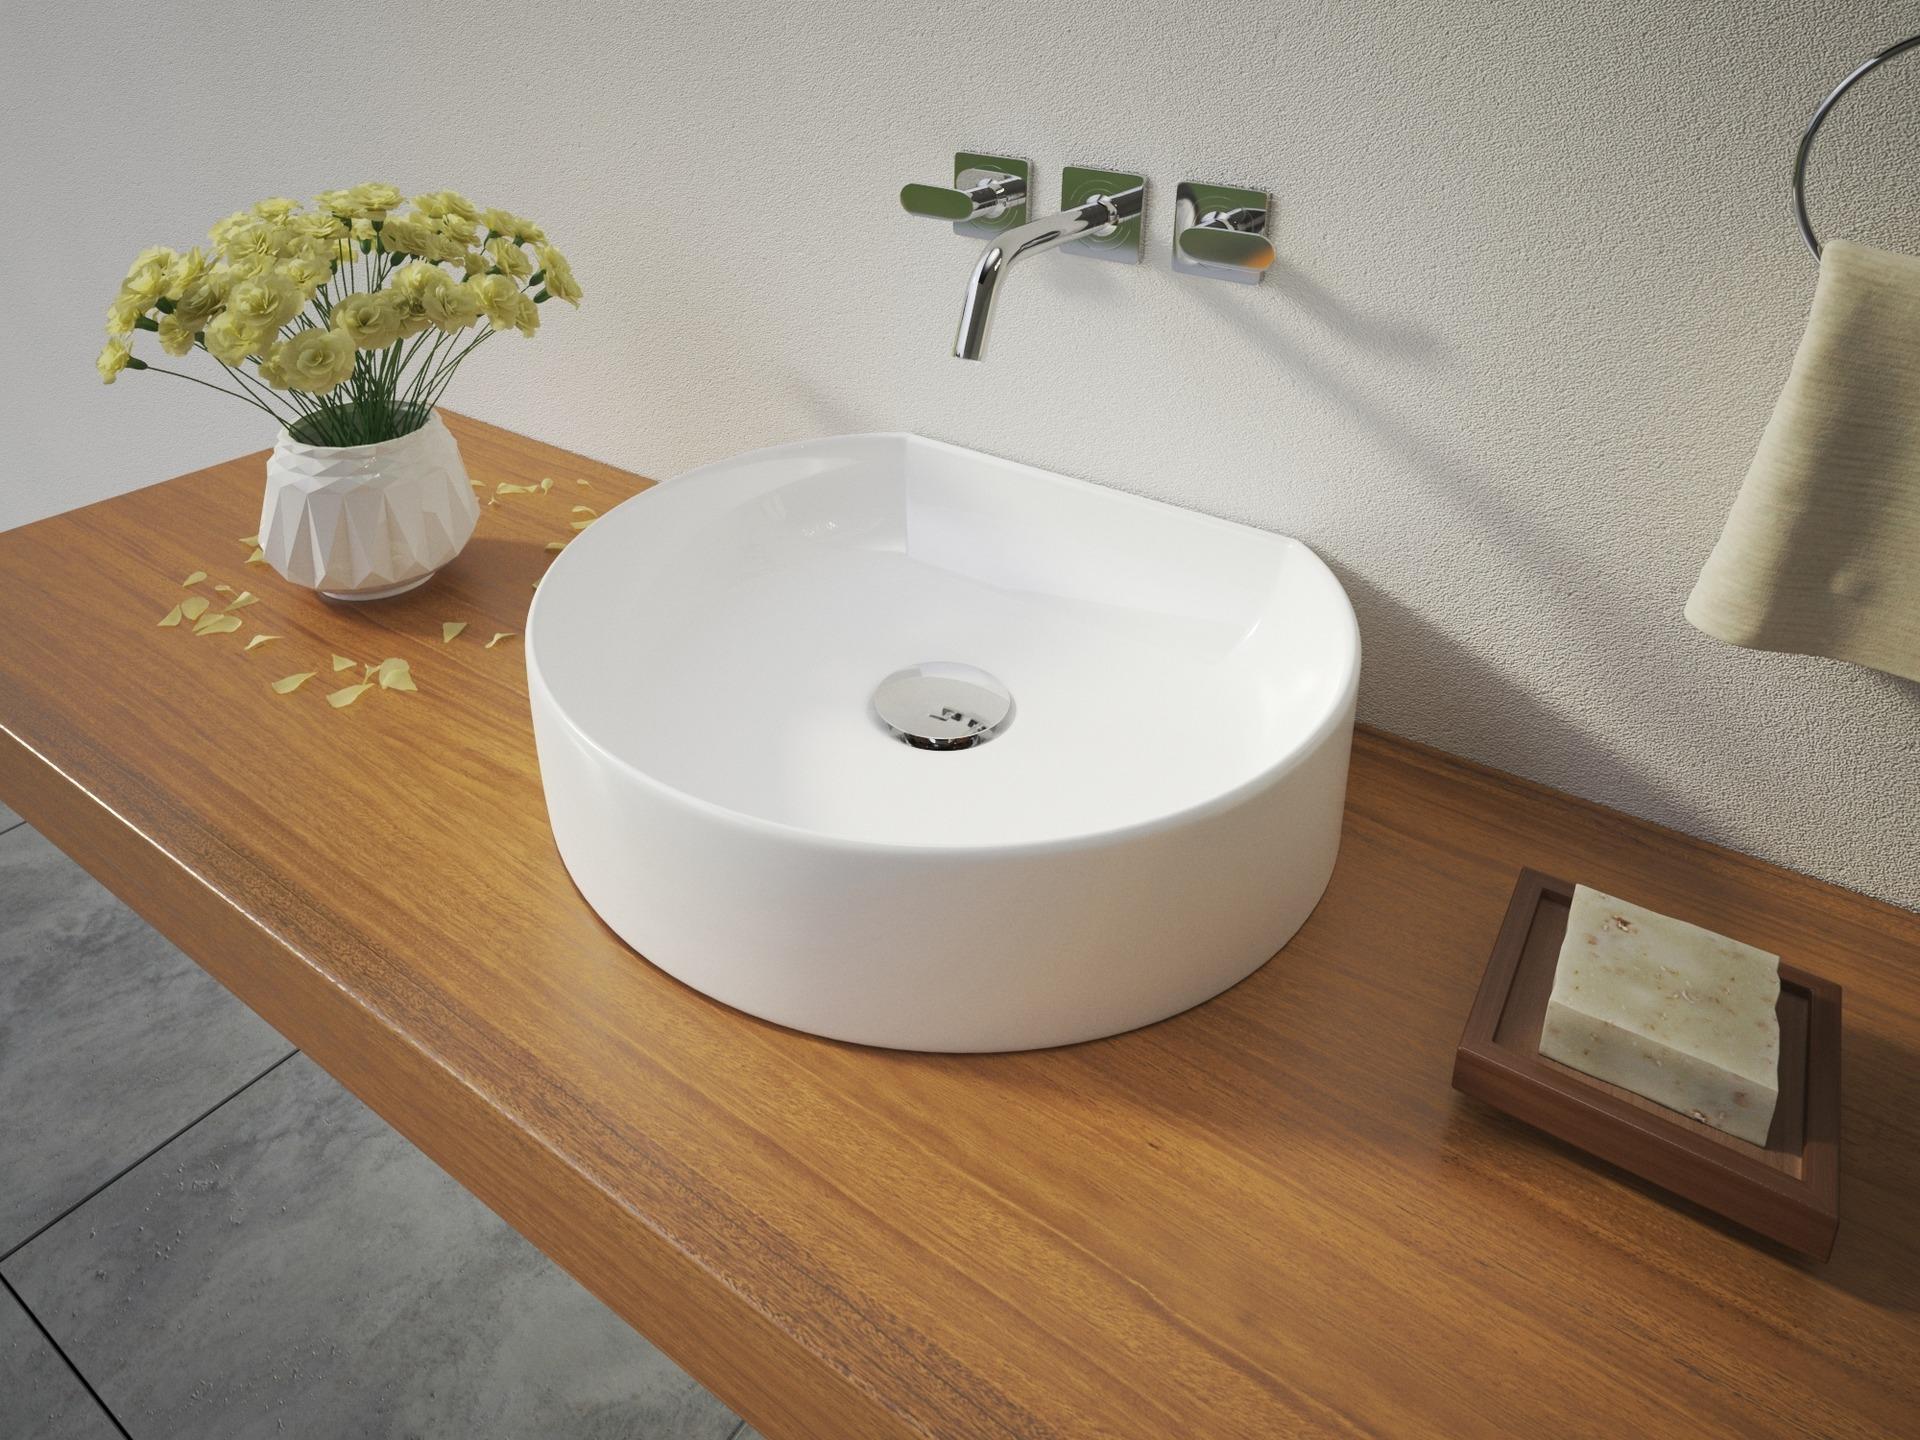 Aquatek Aquatek - REX keramické umyvadlo na desku 40x35x10 cm (REX)